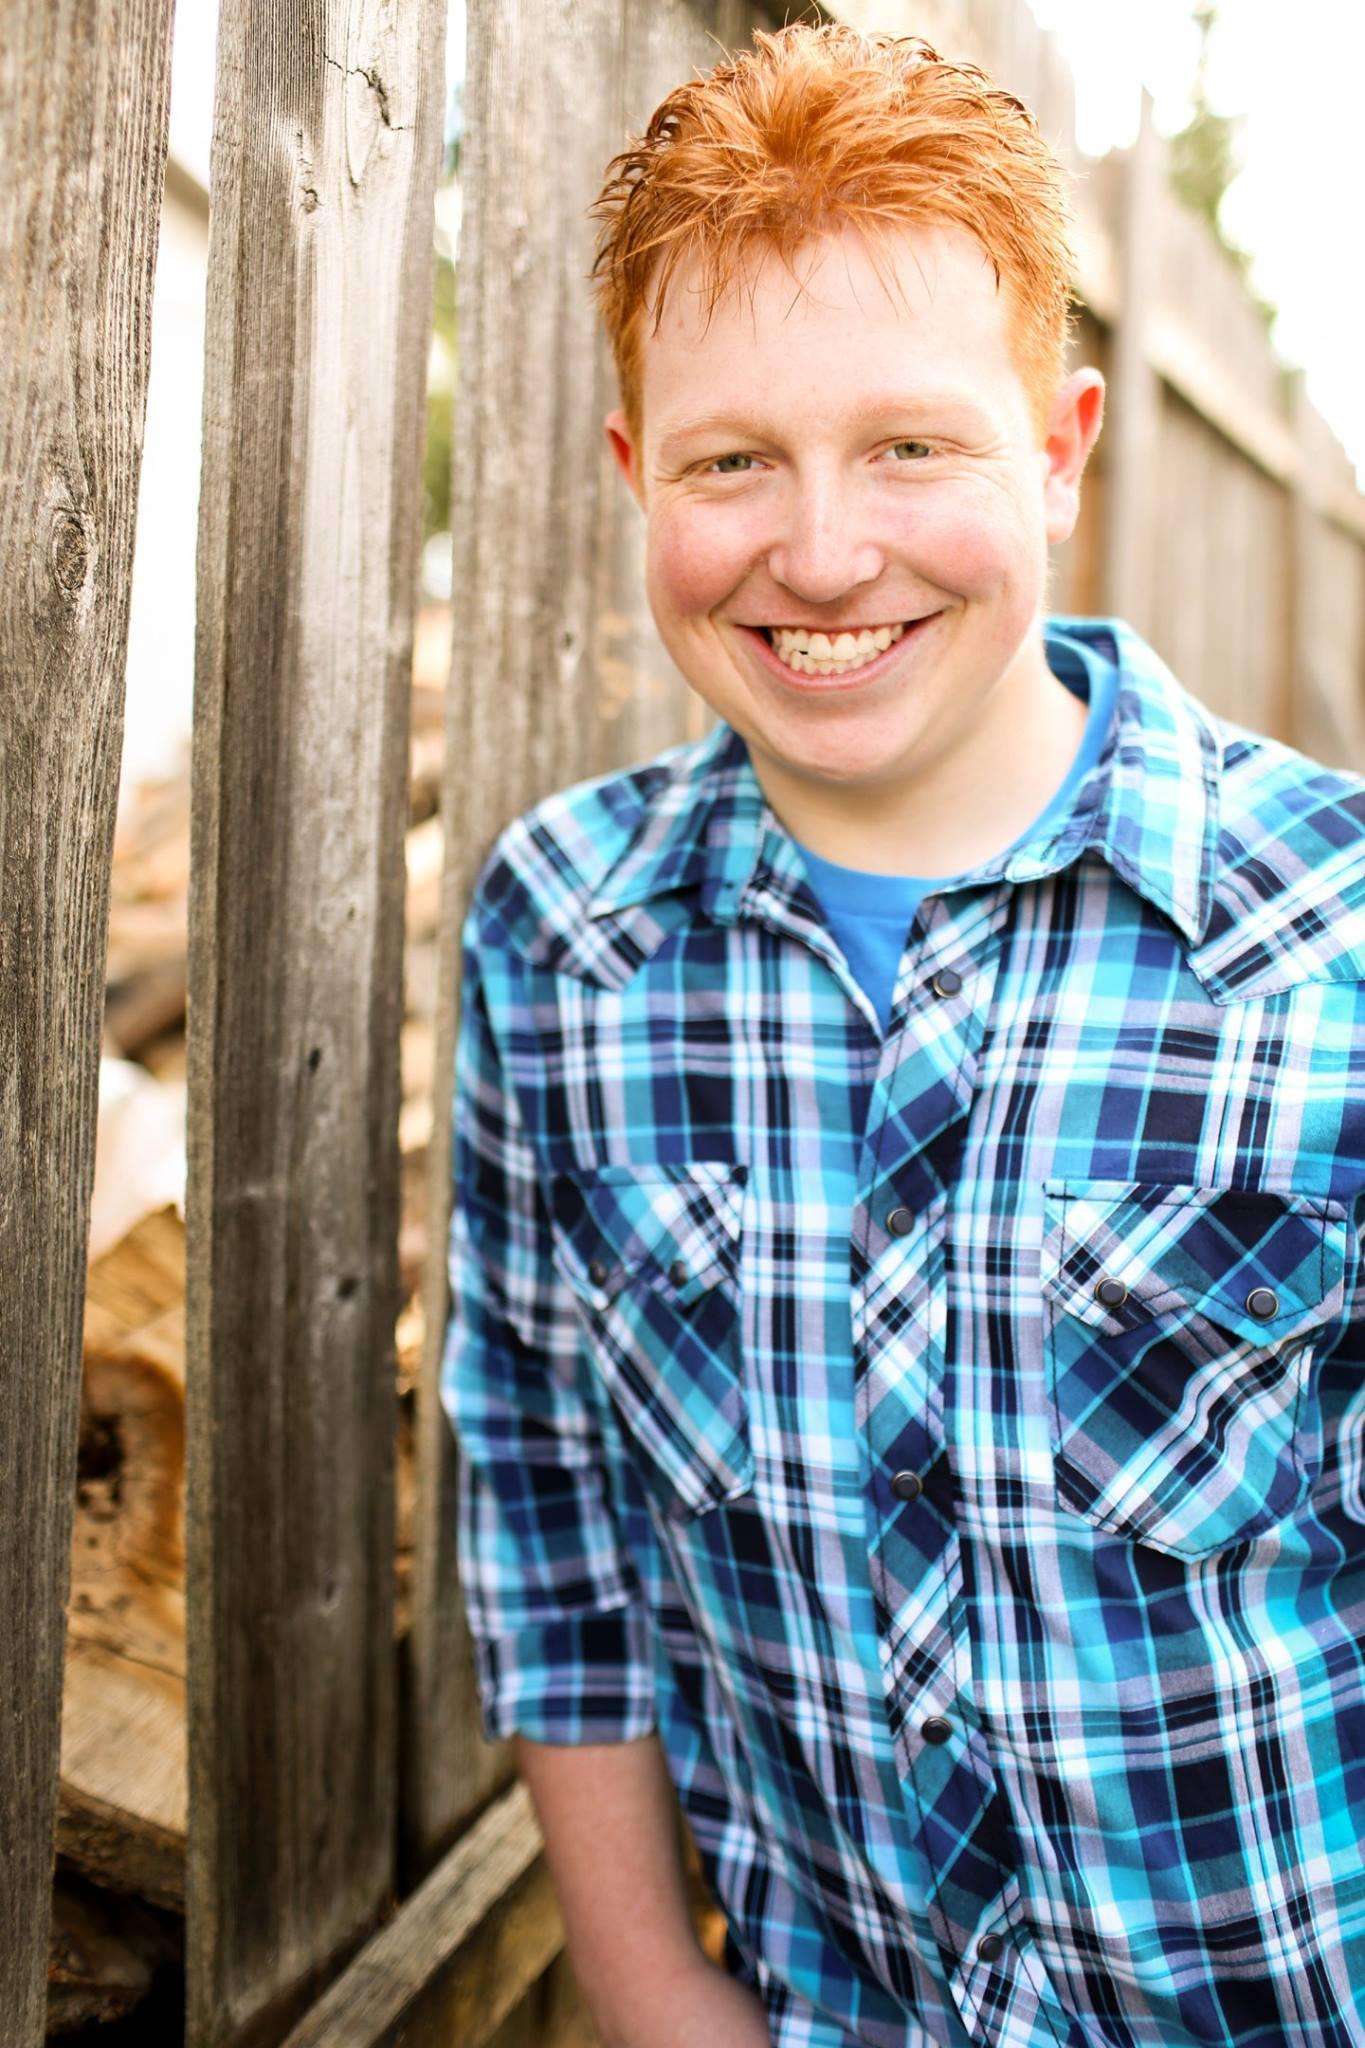 GPFYC 025: Schooled For Success with Entrepreneur/Author Houston Gunn